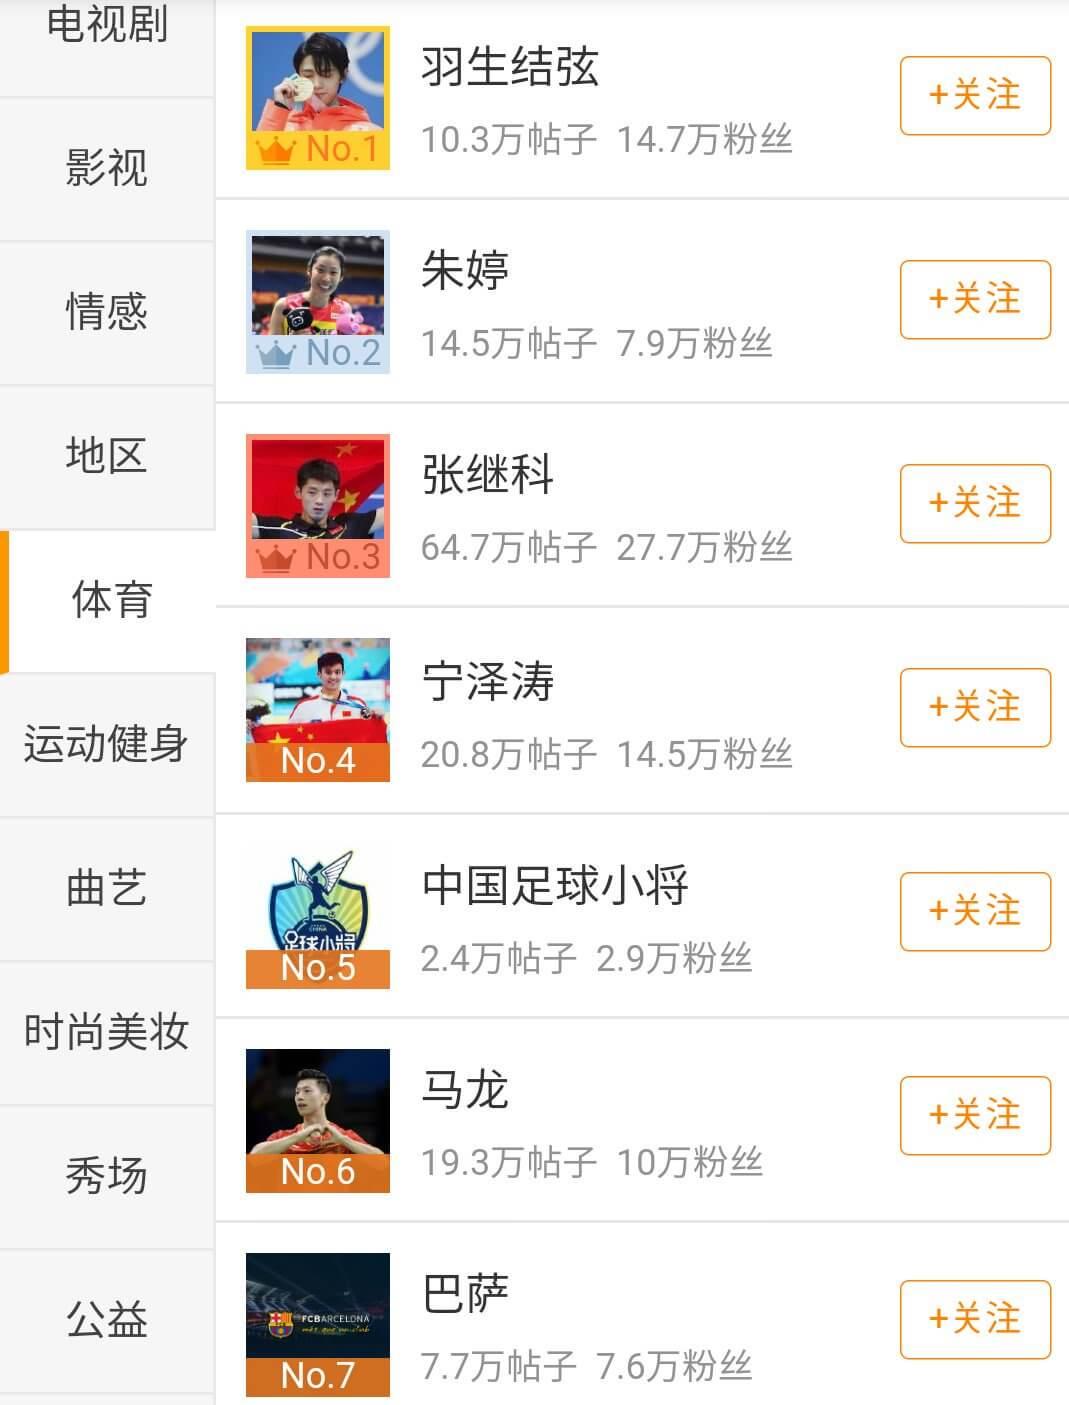 weiboのアスリートランキング現在一位が羽生結弦!自国の選手差し置いての1位は凄すぎるw